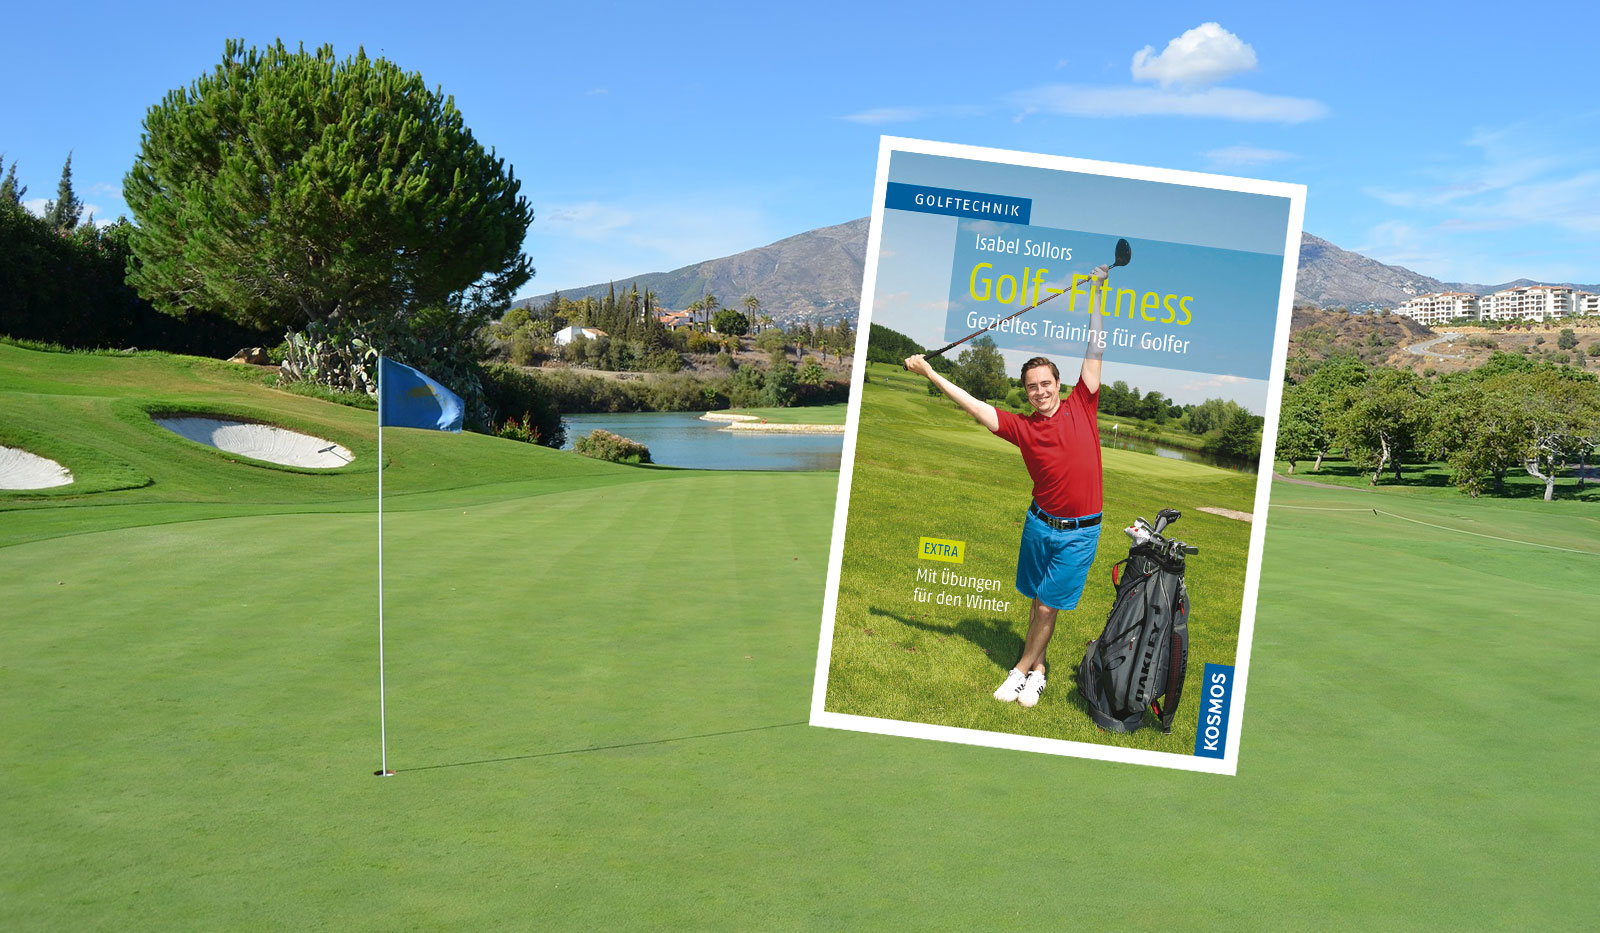 Golfplatz und Cover Golf Fitness